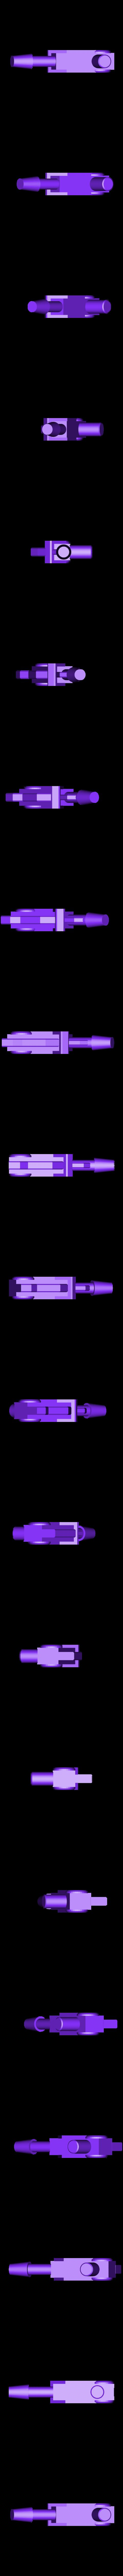 simple_gun.stl Download free STL file Transformers guns • 3D printable model, sickofyou